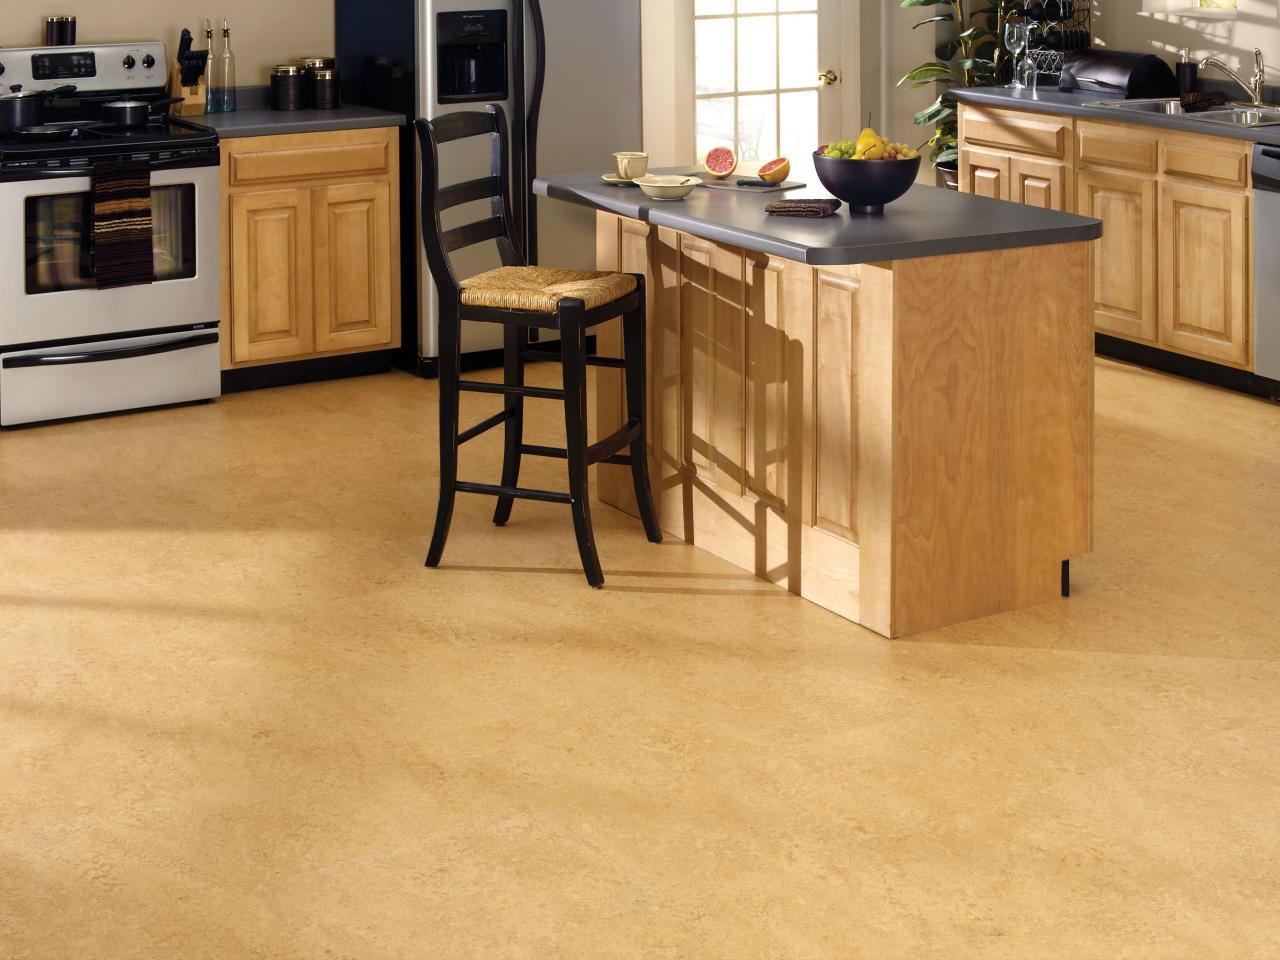 os-floors_corkoleum-kitchen_s4x3-jpg-rend-hgtvcom-1280-960